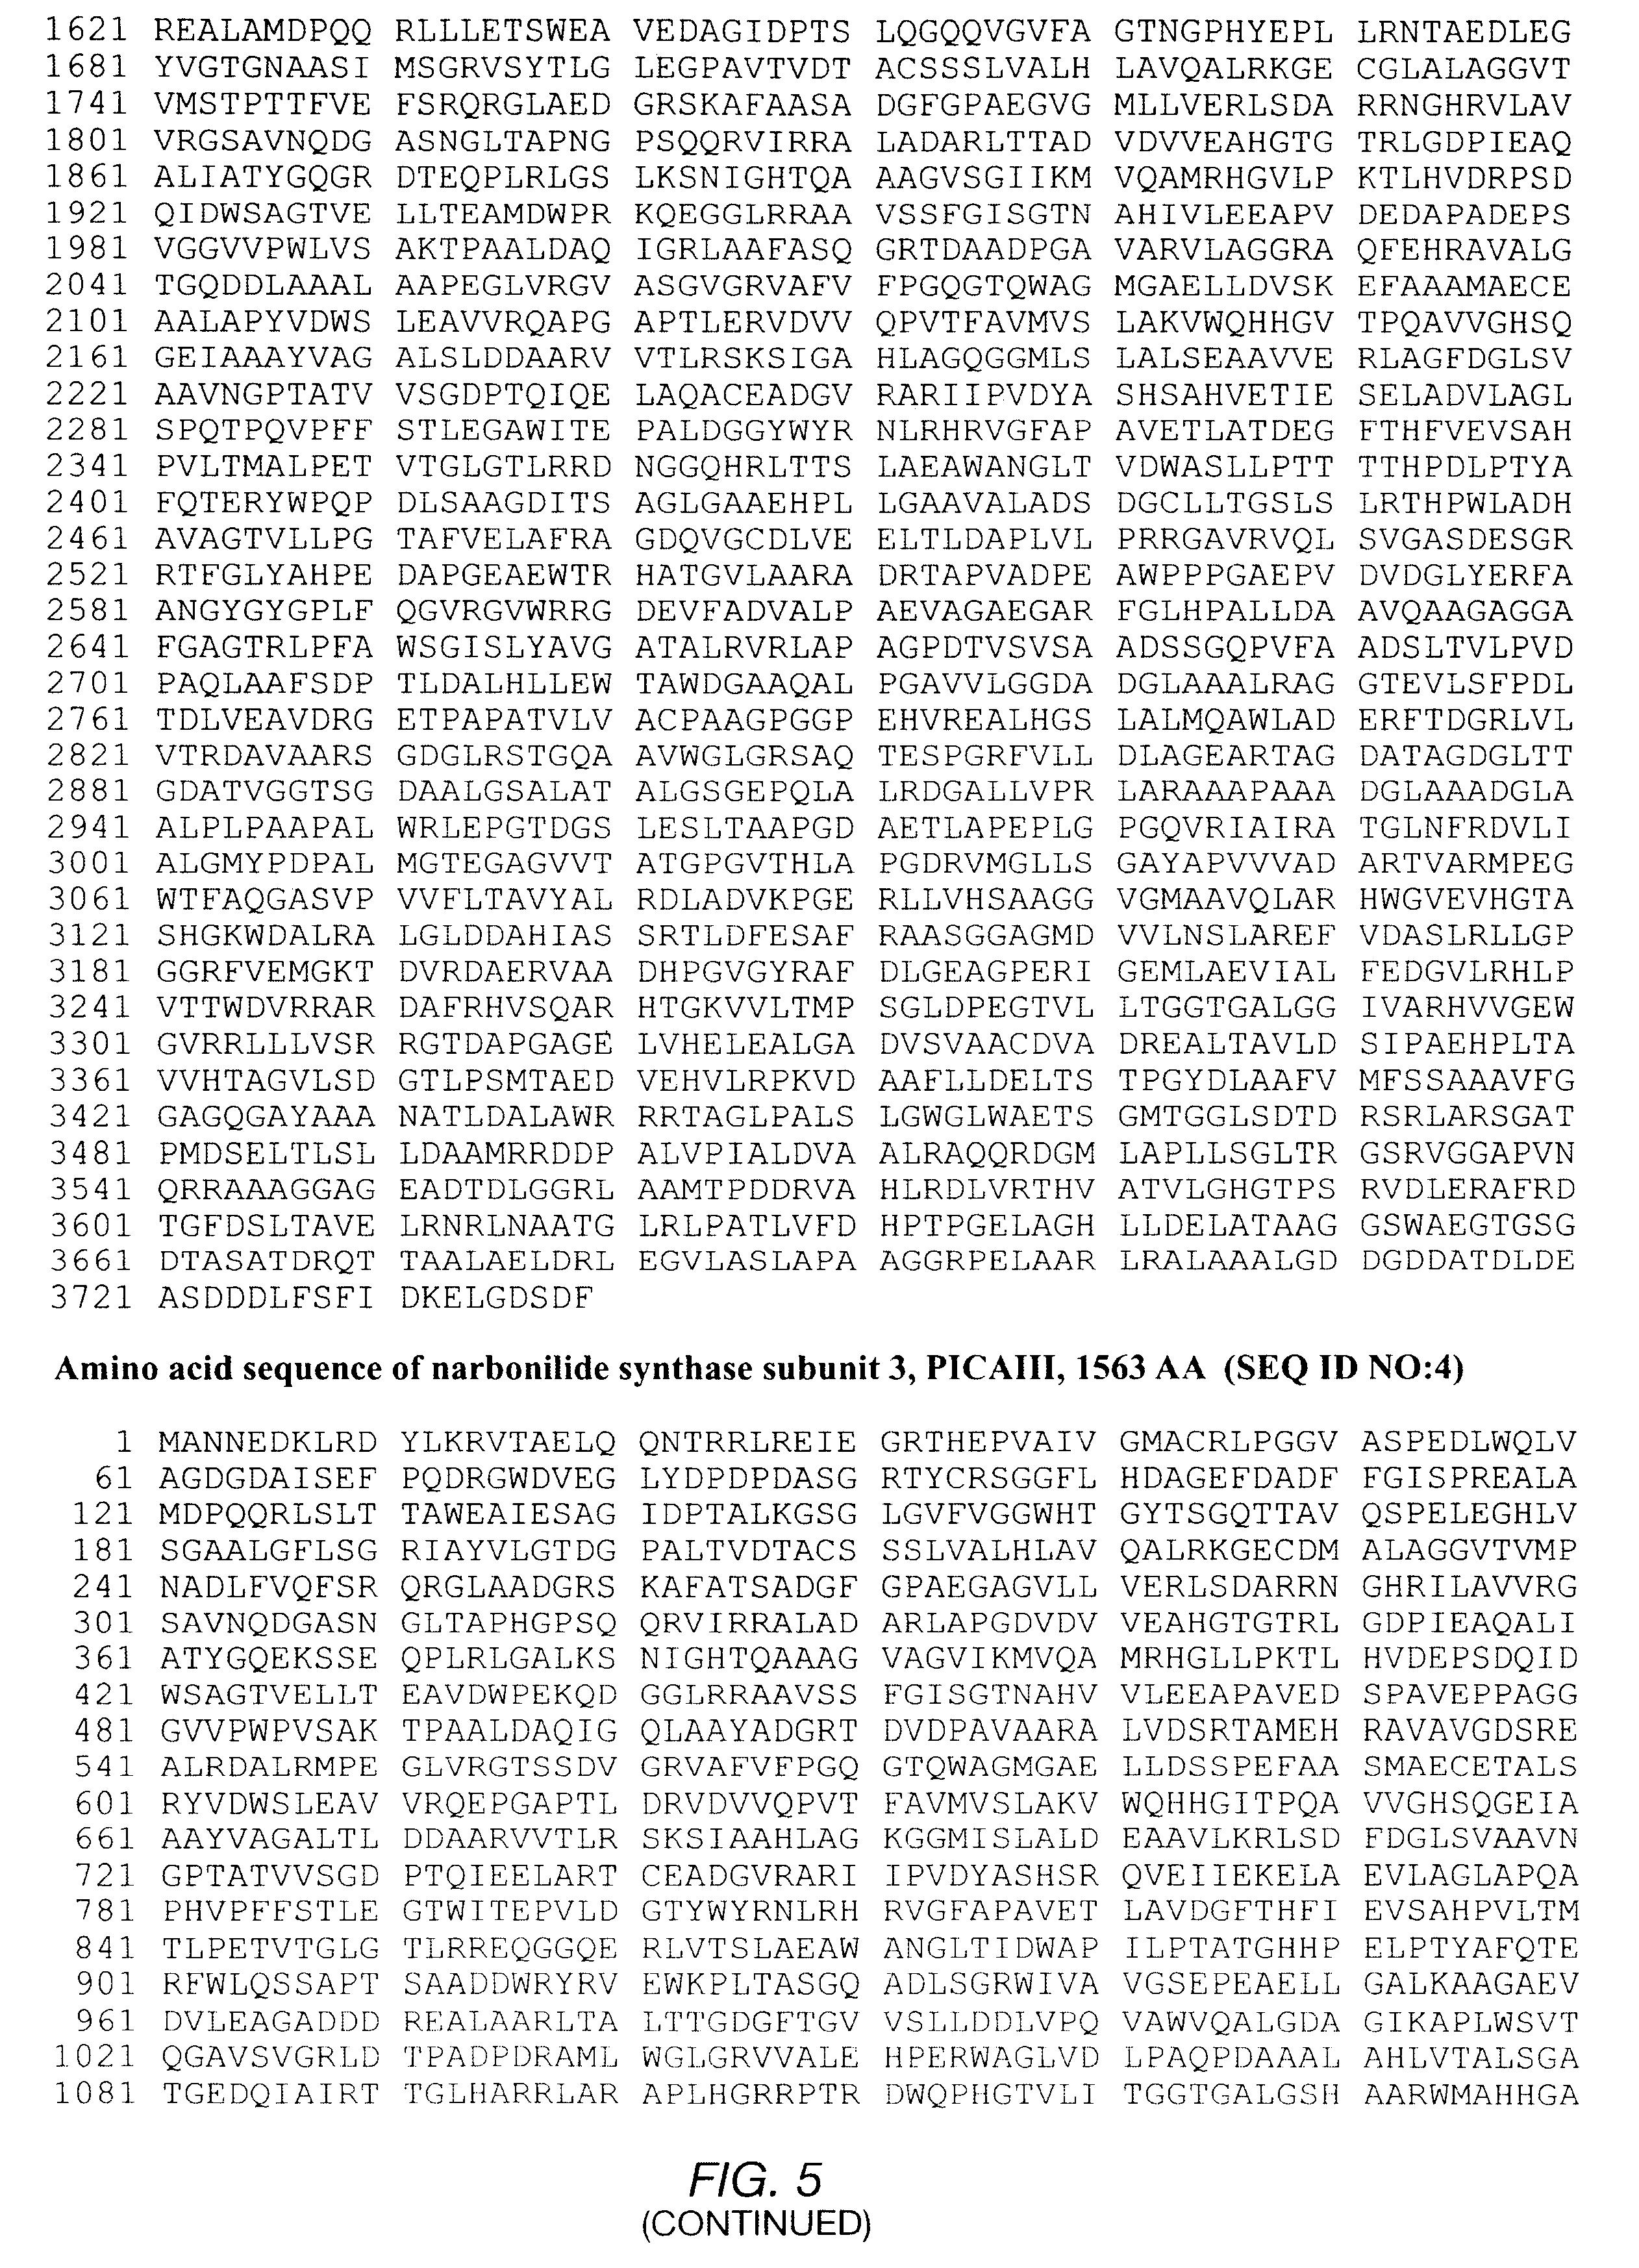 gene chlr in streptomyces venezuelae New insights into chloramphenicol biosynthesis in streptomyces venezuelae atcc 10712 lorena t fernández-martínez, chiara borsetto, juan pablo gomez-escribano.